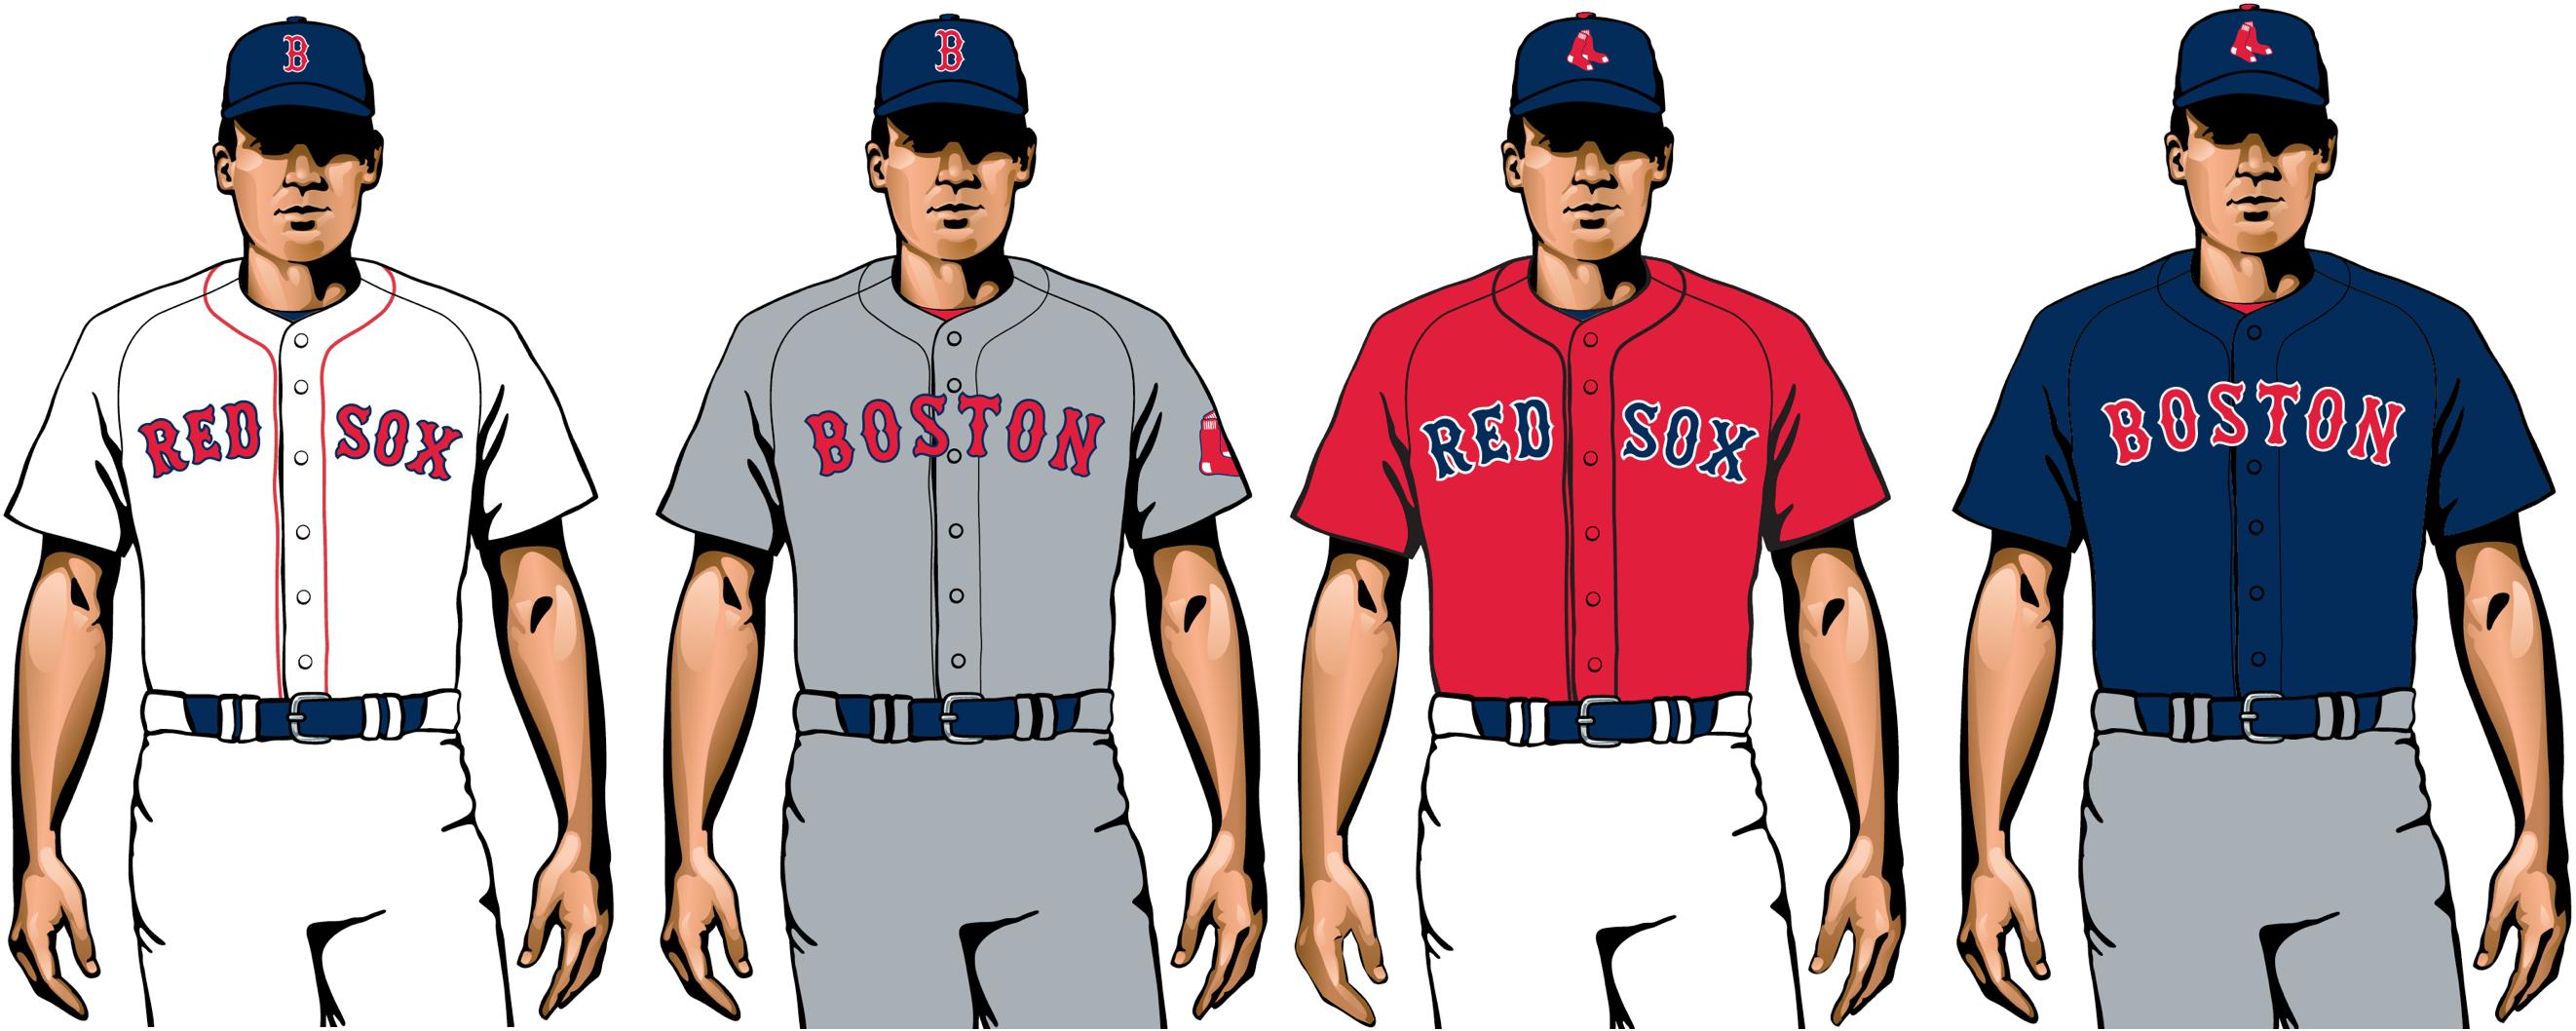 Boston Red Sox 2020 uniformes